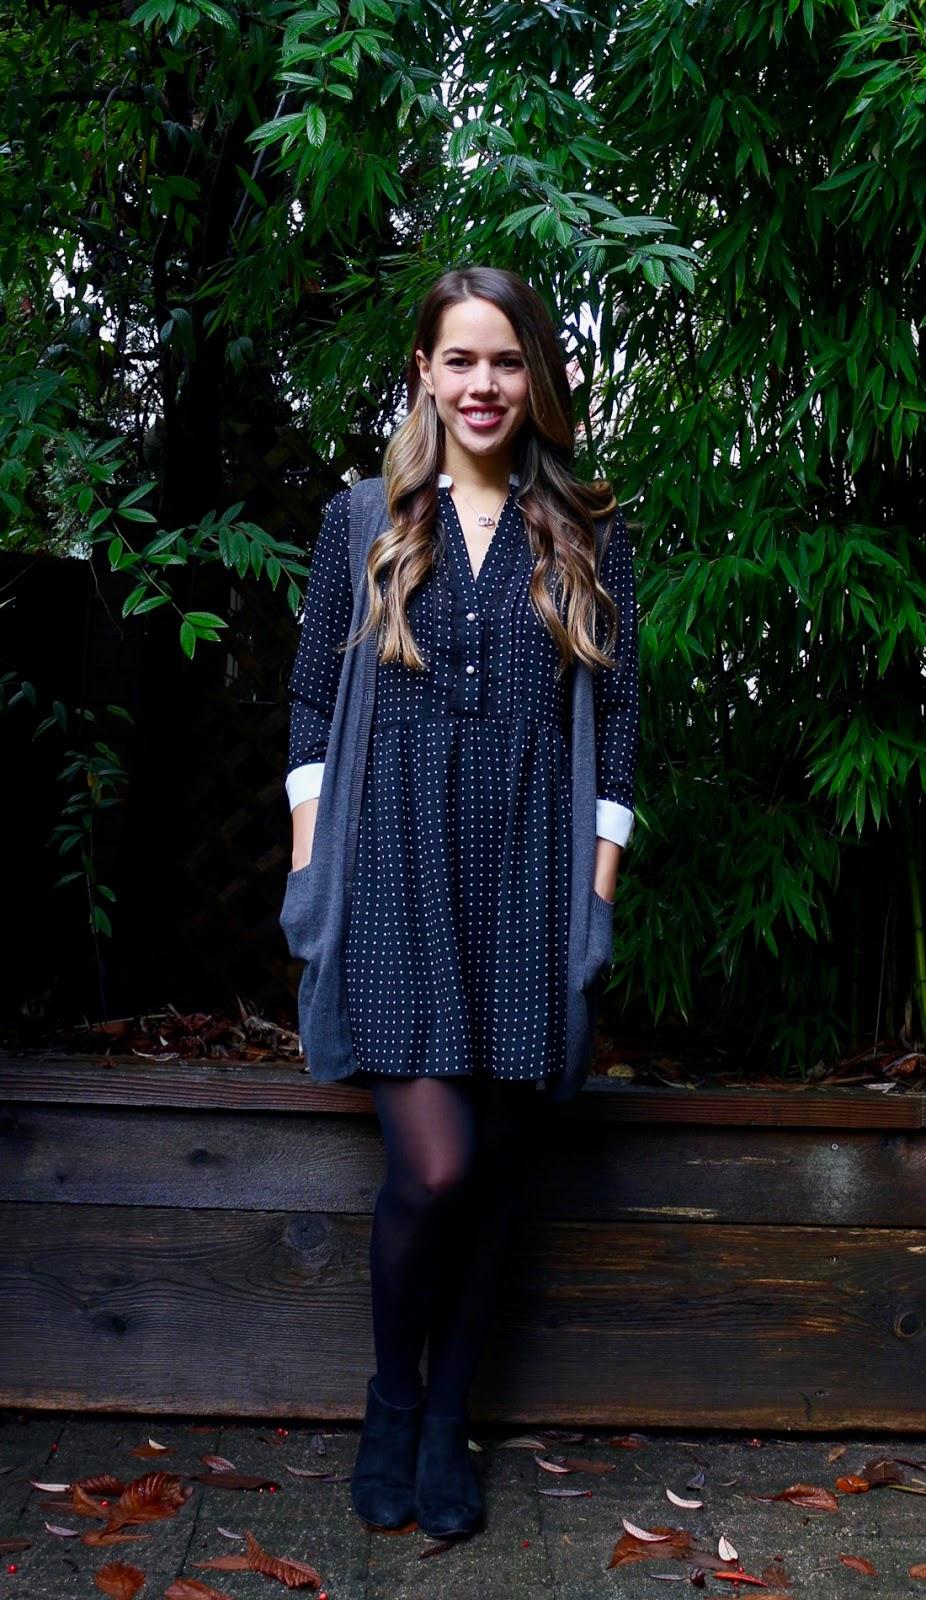 Jules in Flats - Zara Polka Dot Dress + Sweater Vest (Business Casual Fall Workwear on a Budget)